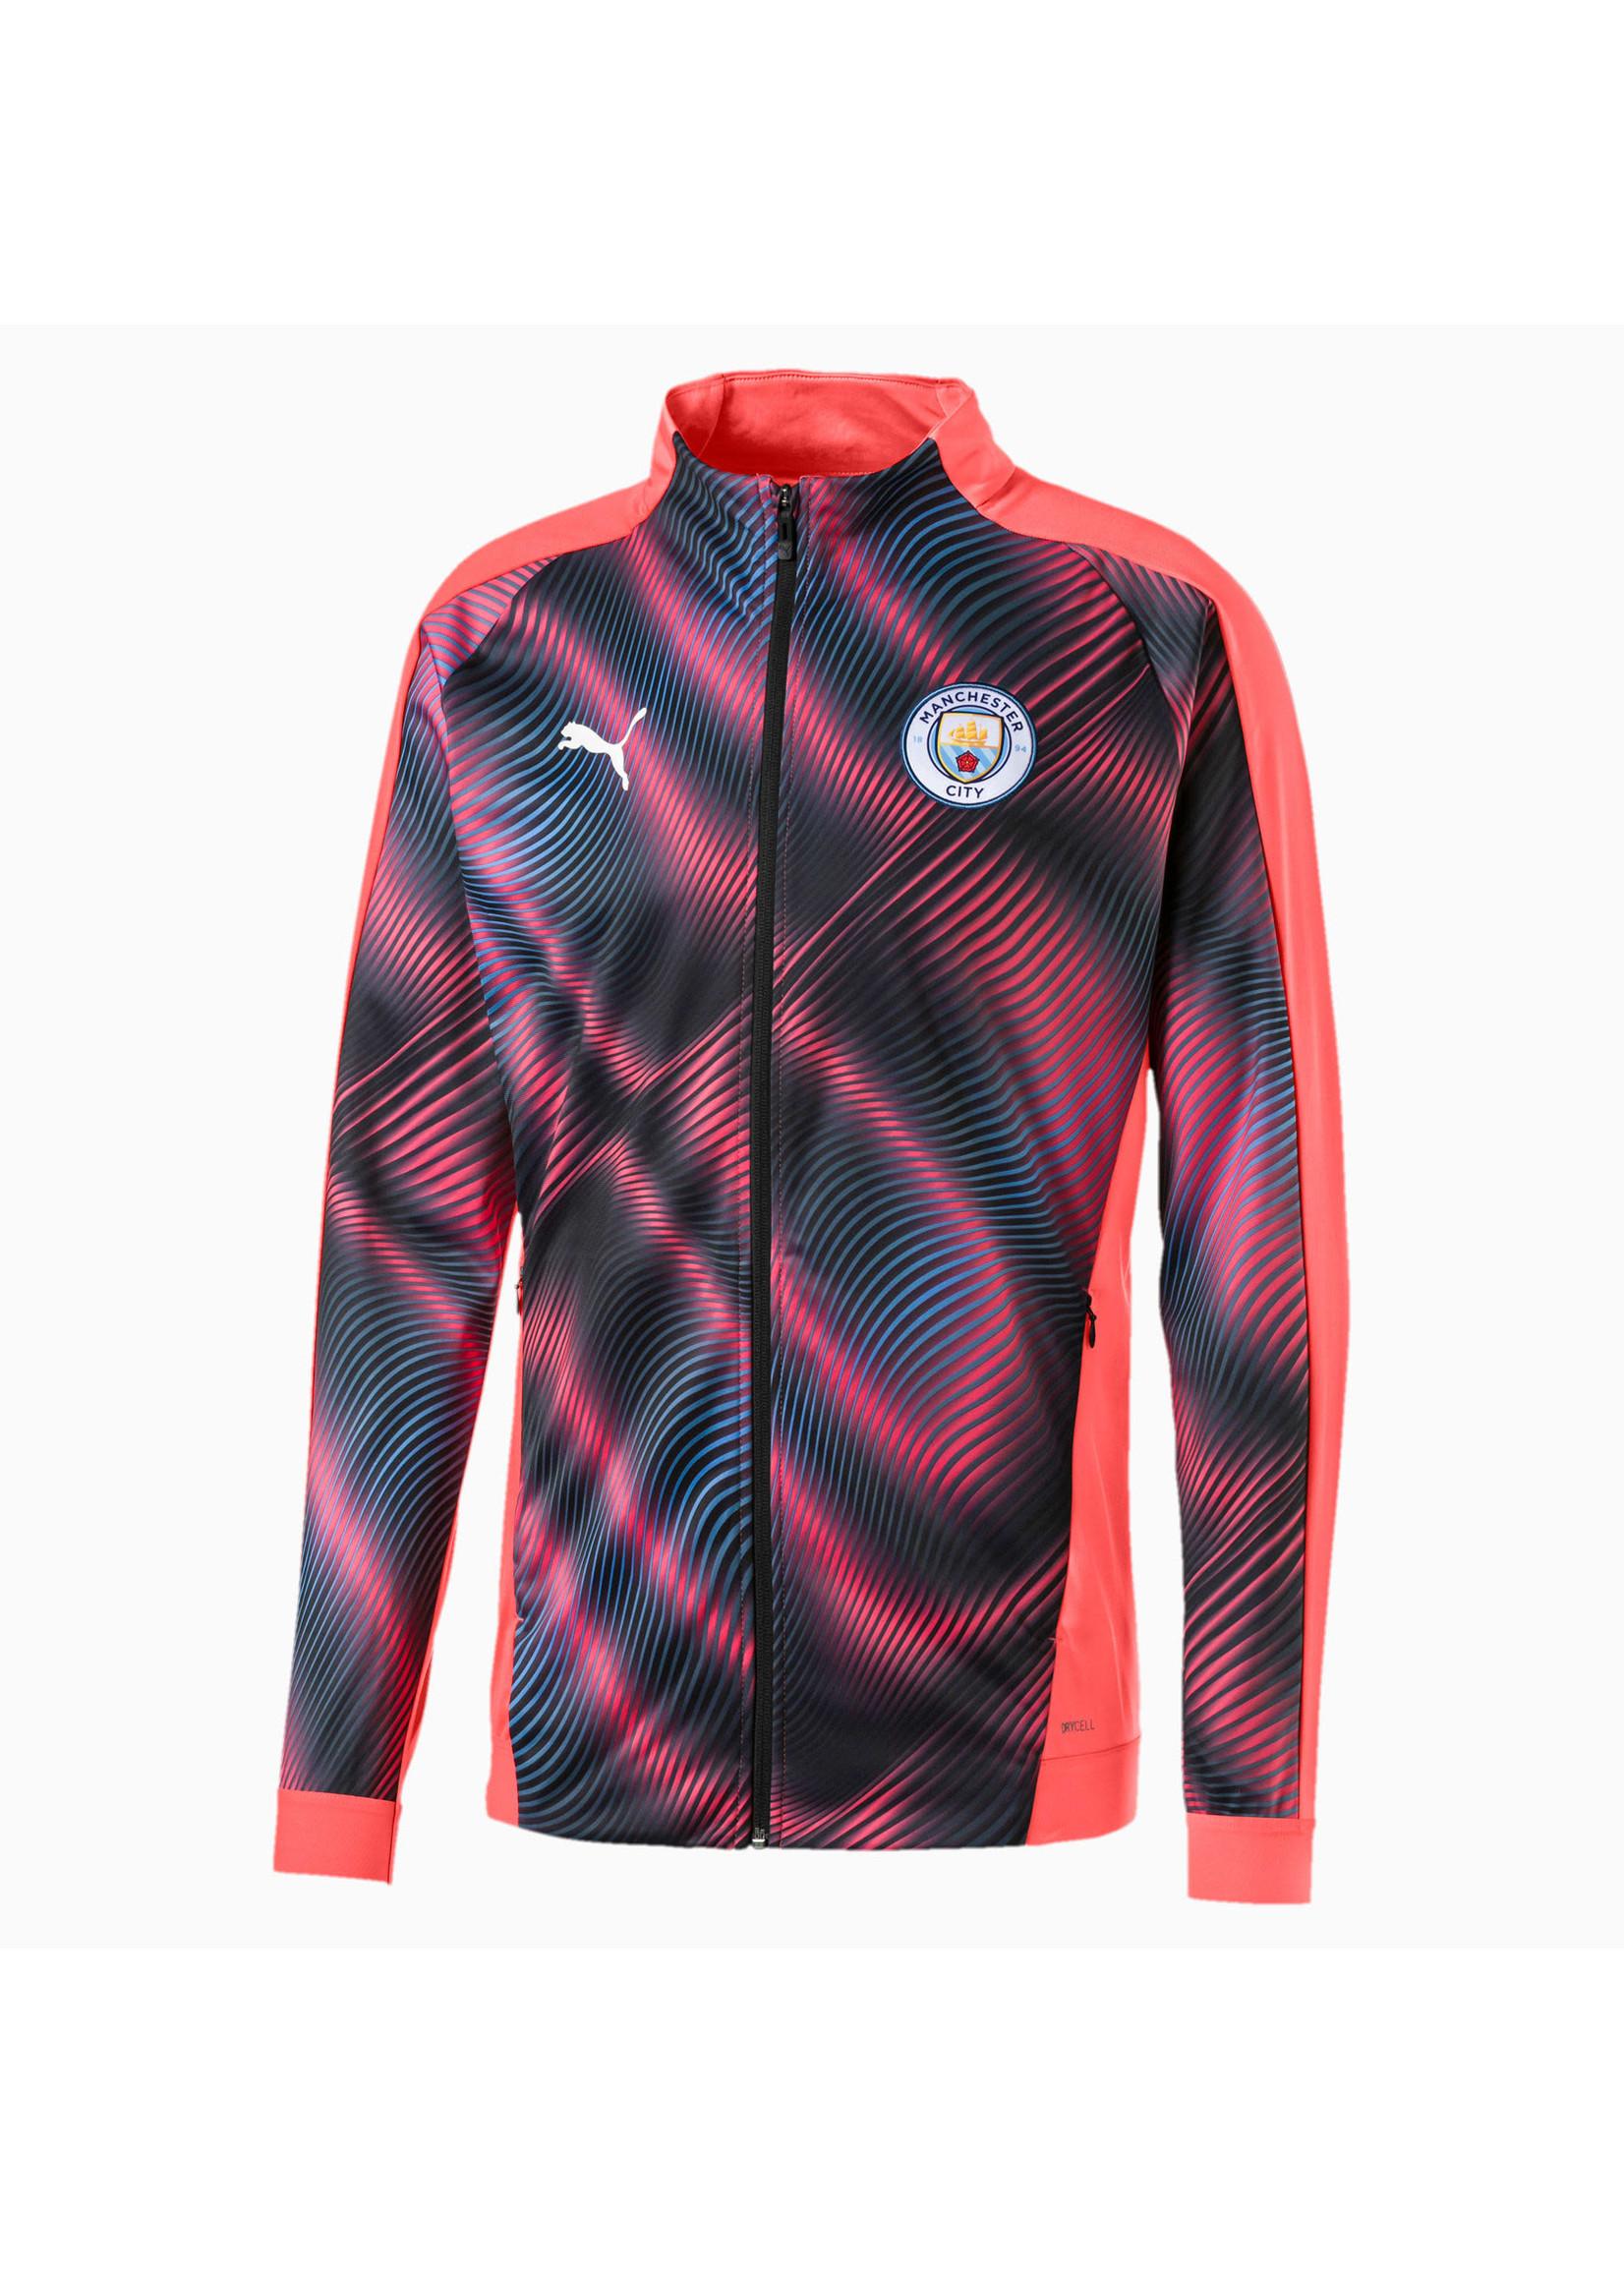 Puma Manchester City Stadium Track Jacket - Pink/Blue